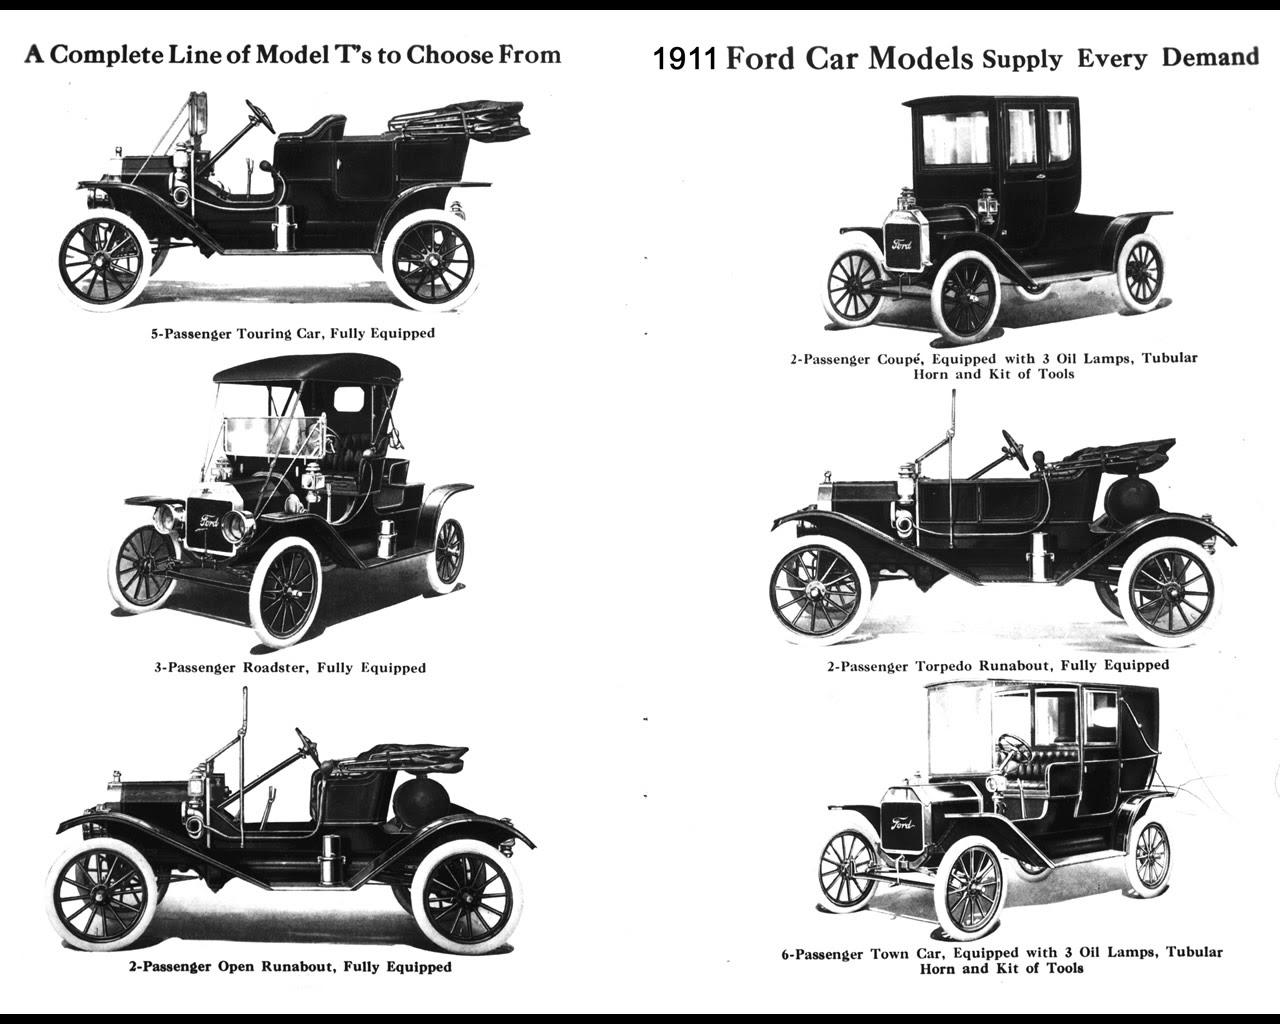 http://www.autoconcept-reviews.com/cars_reviews/ford/ford-model-t-1908-1925/wallpaper/1911%20FordModelT1911Line-Upad_HR%20copy.jpg